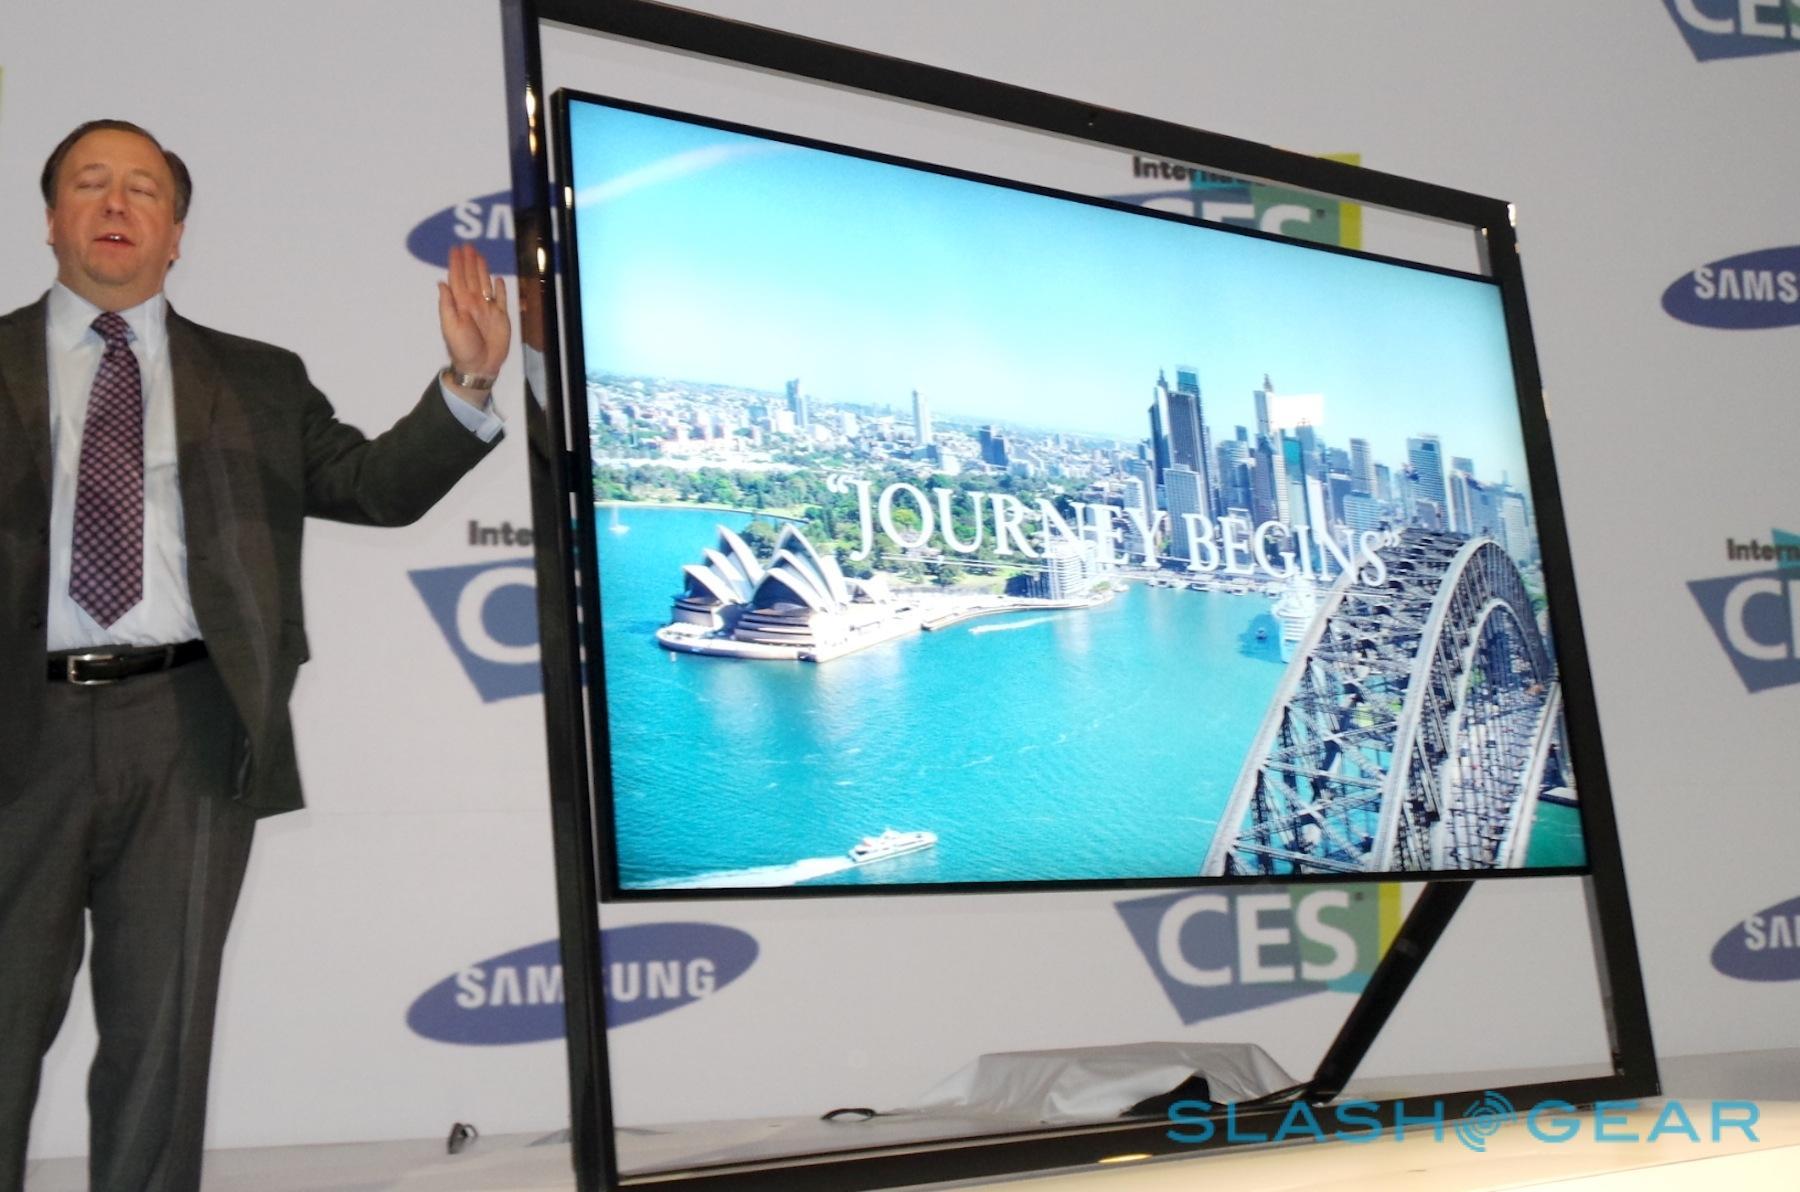 samsung 85 inch ultra hd un85s9000 tv eyes on slashgear. Black Bedroom Furniture Sets. Home Design Ideas